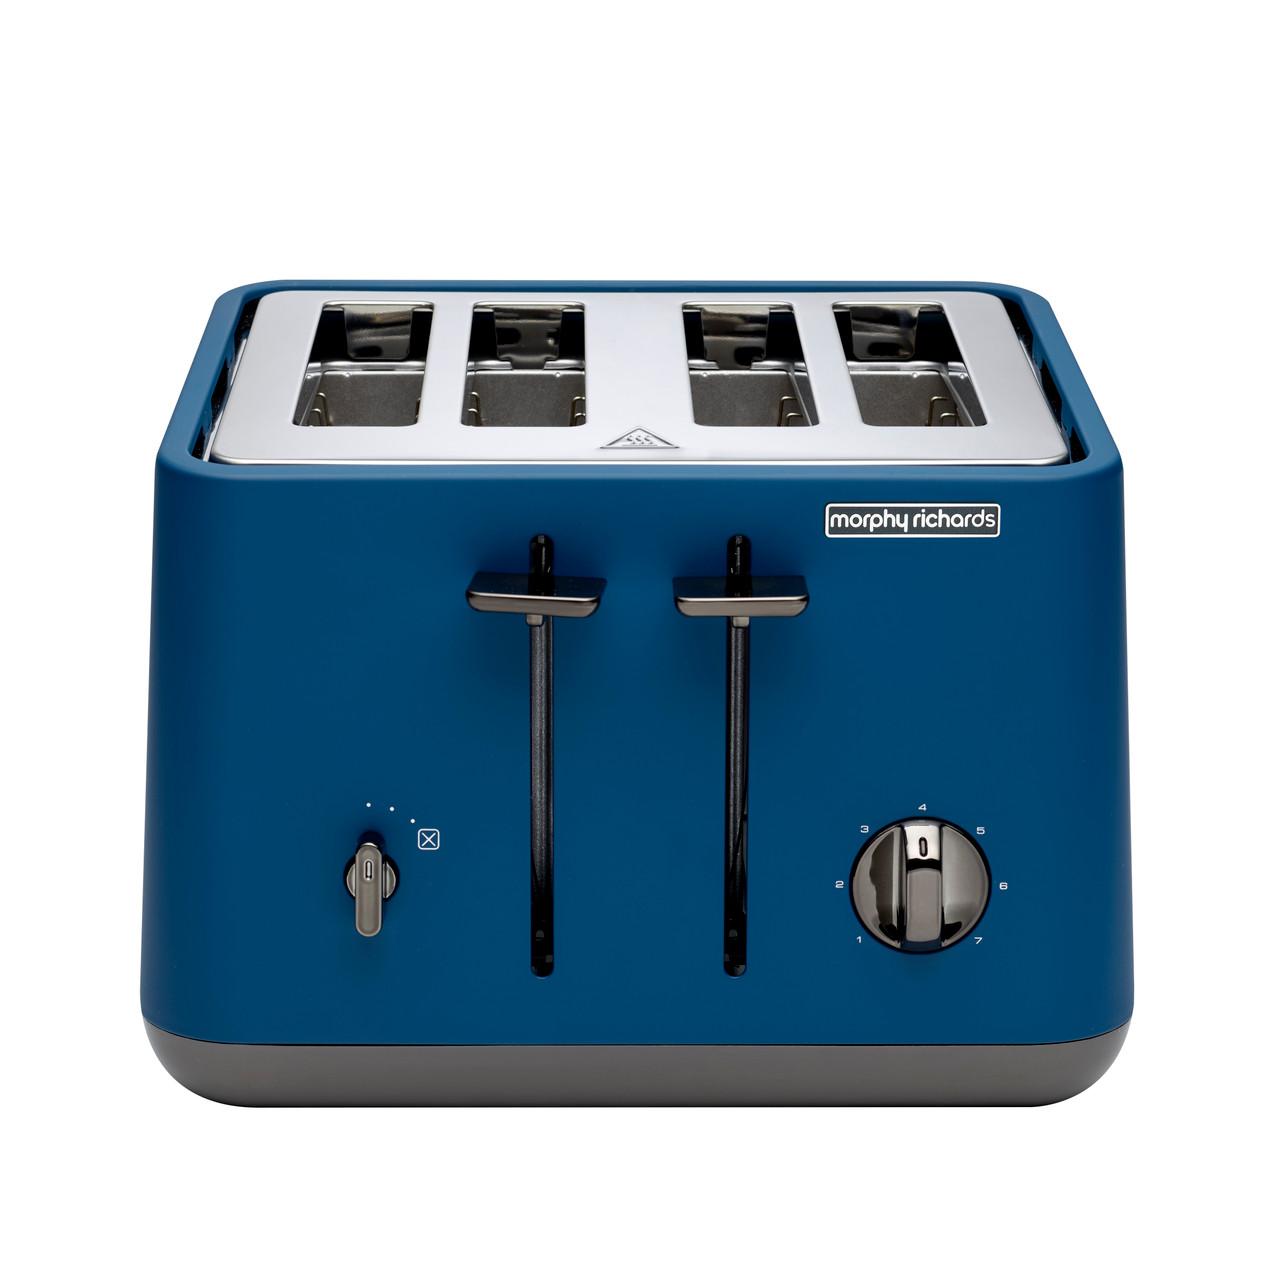 Morphy Richards 240022 Aspect Black Chrome 1880W 4 Slice Toaster – Deep Blue